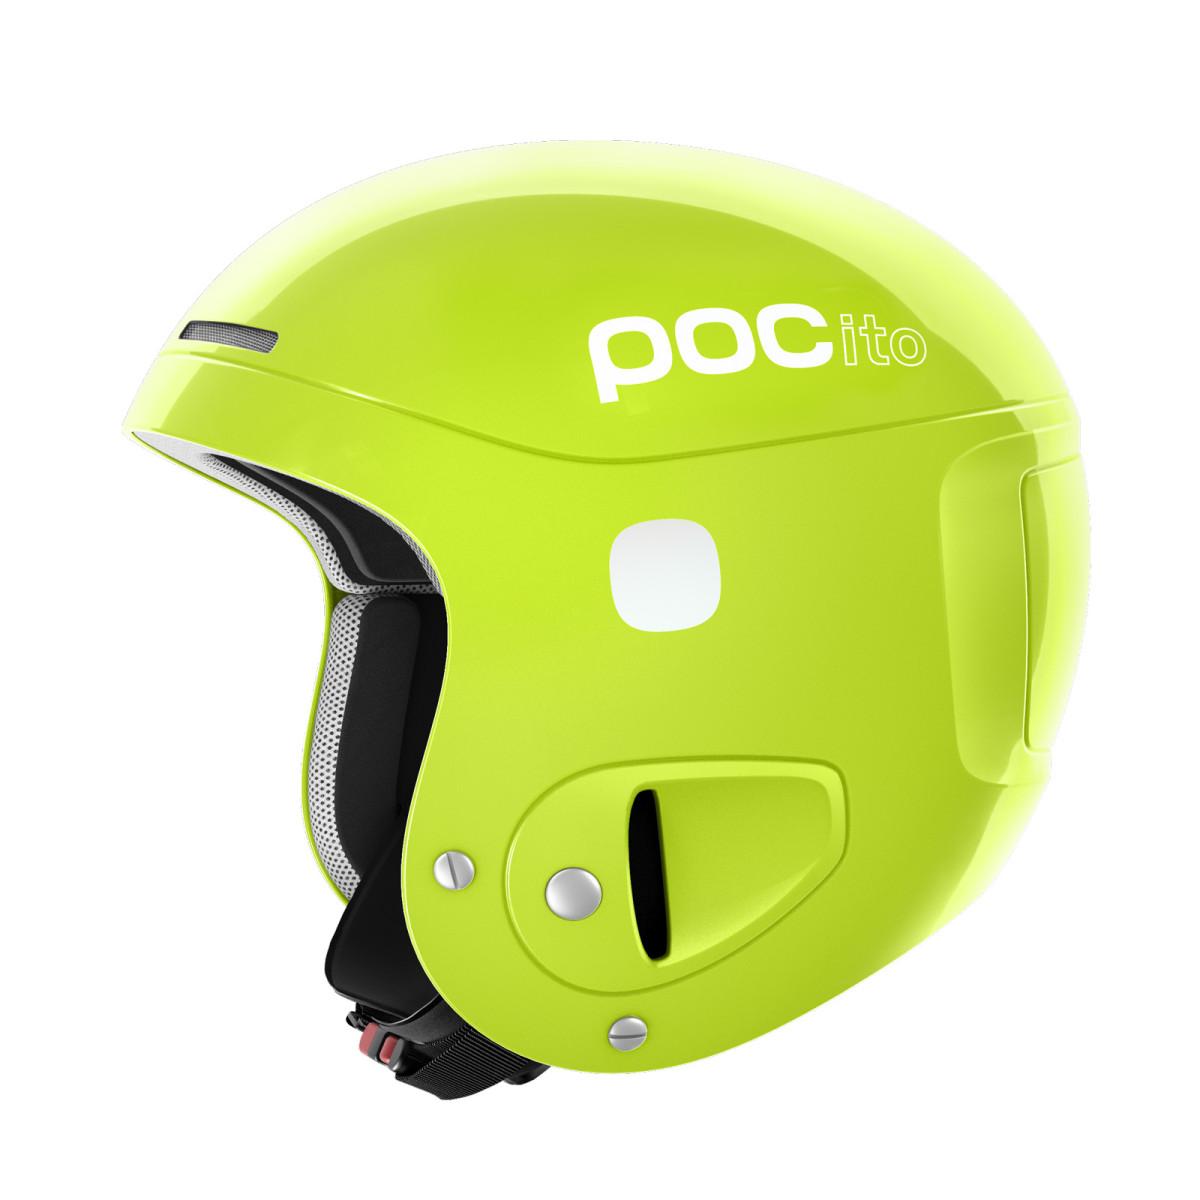 POC Pocito Skull - zelená Velikost helmy: XS/S 2019/2020